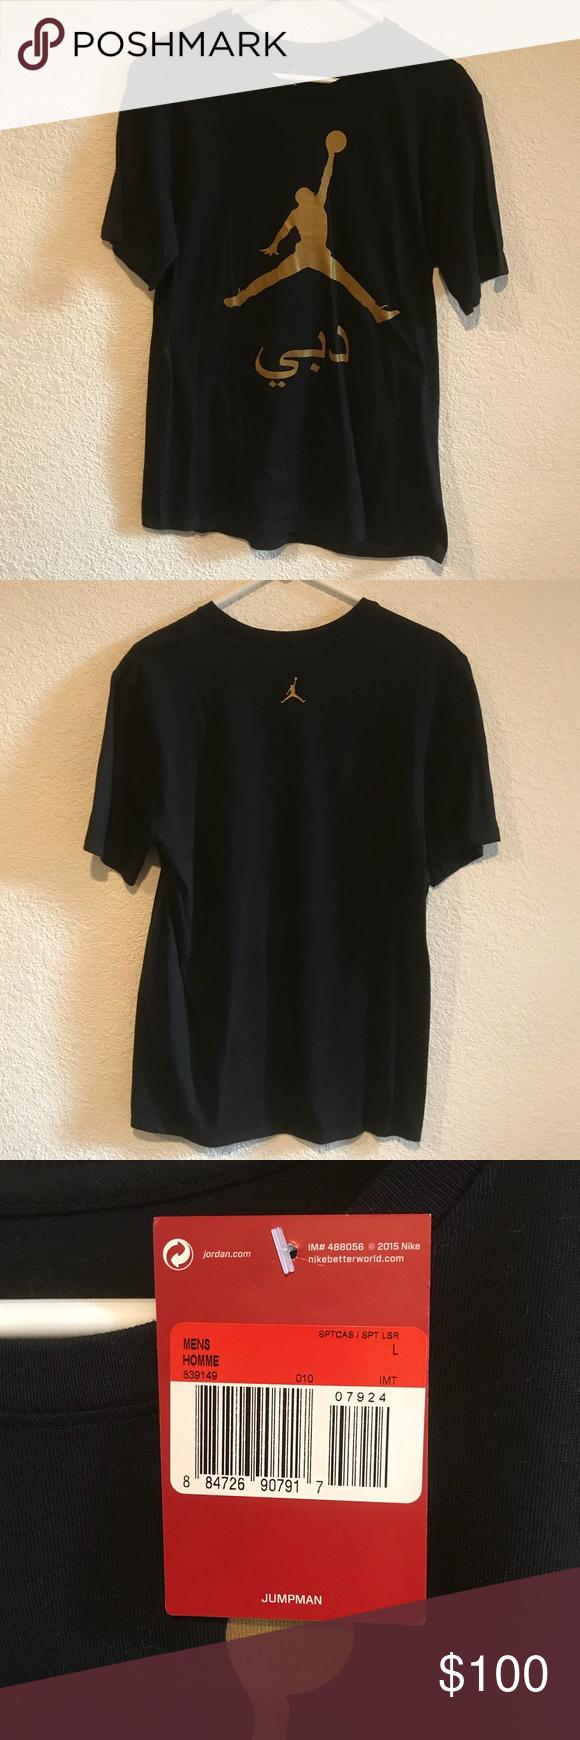 "1874f2cf6 Air Jordan Dubai City Shirt 839149-010 Gold Large I'm selling a Brand New  With Tags Air Jordan ""Dubai City"" Shirt in Black with Gold print!"